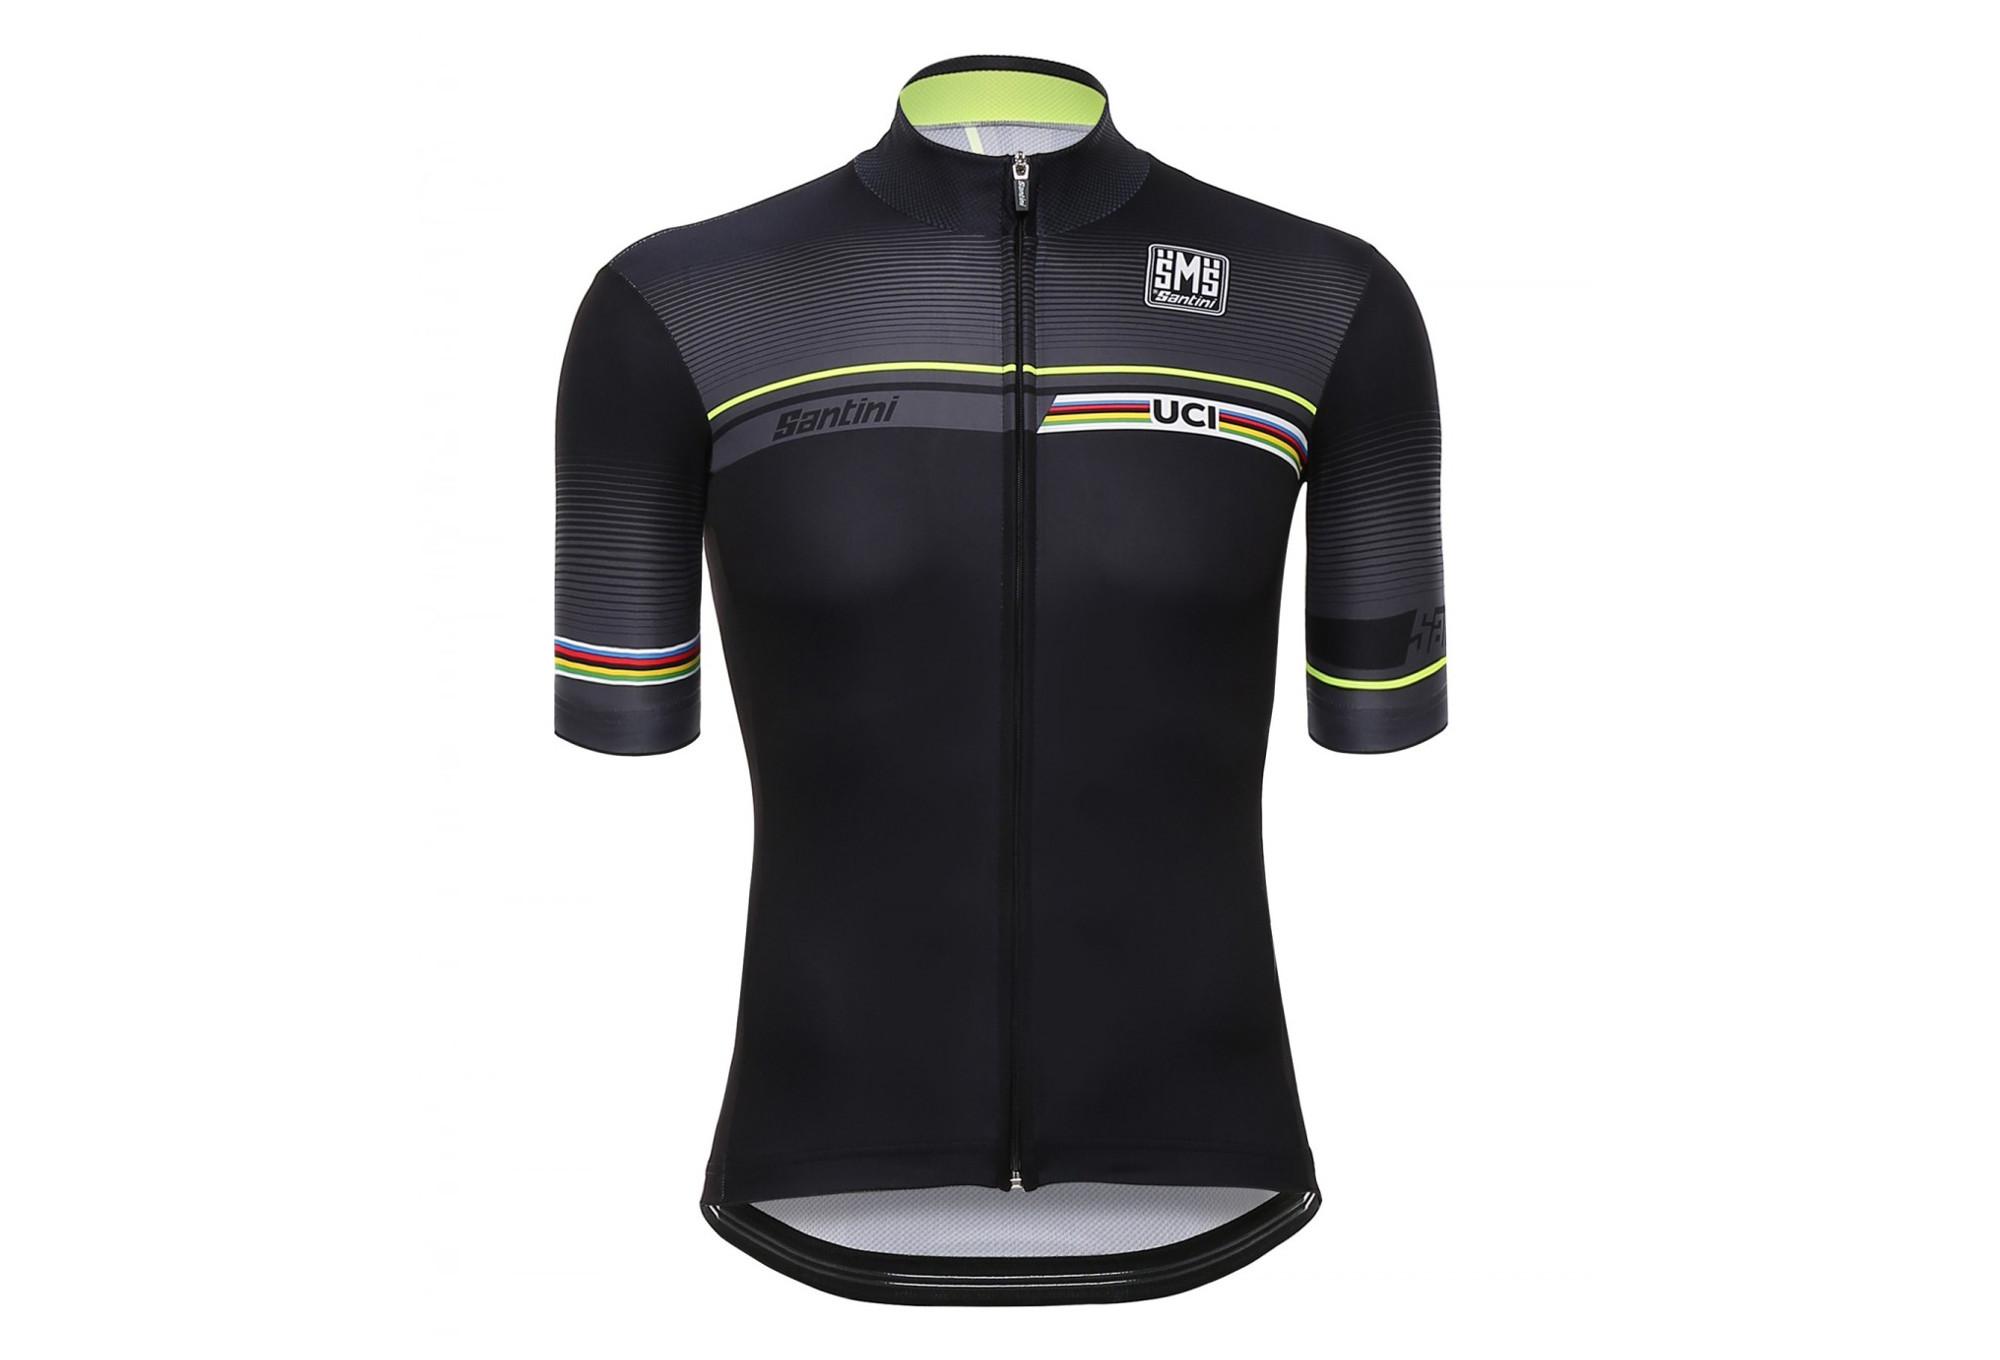 SANTINI Short Sleeve Jersey UCI IRIDE Black Yellow  aeb1182a7